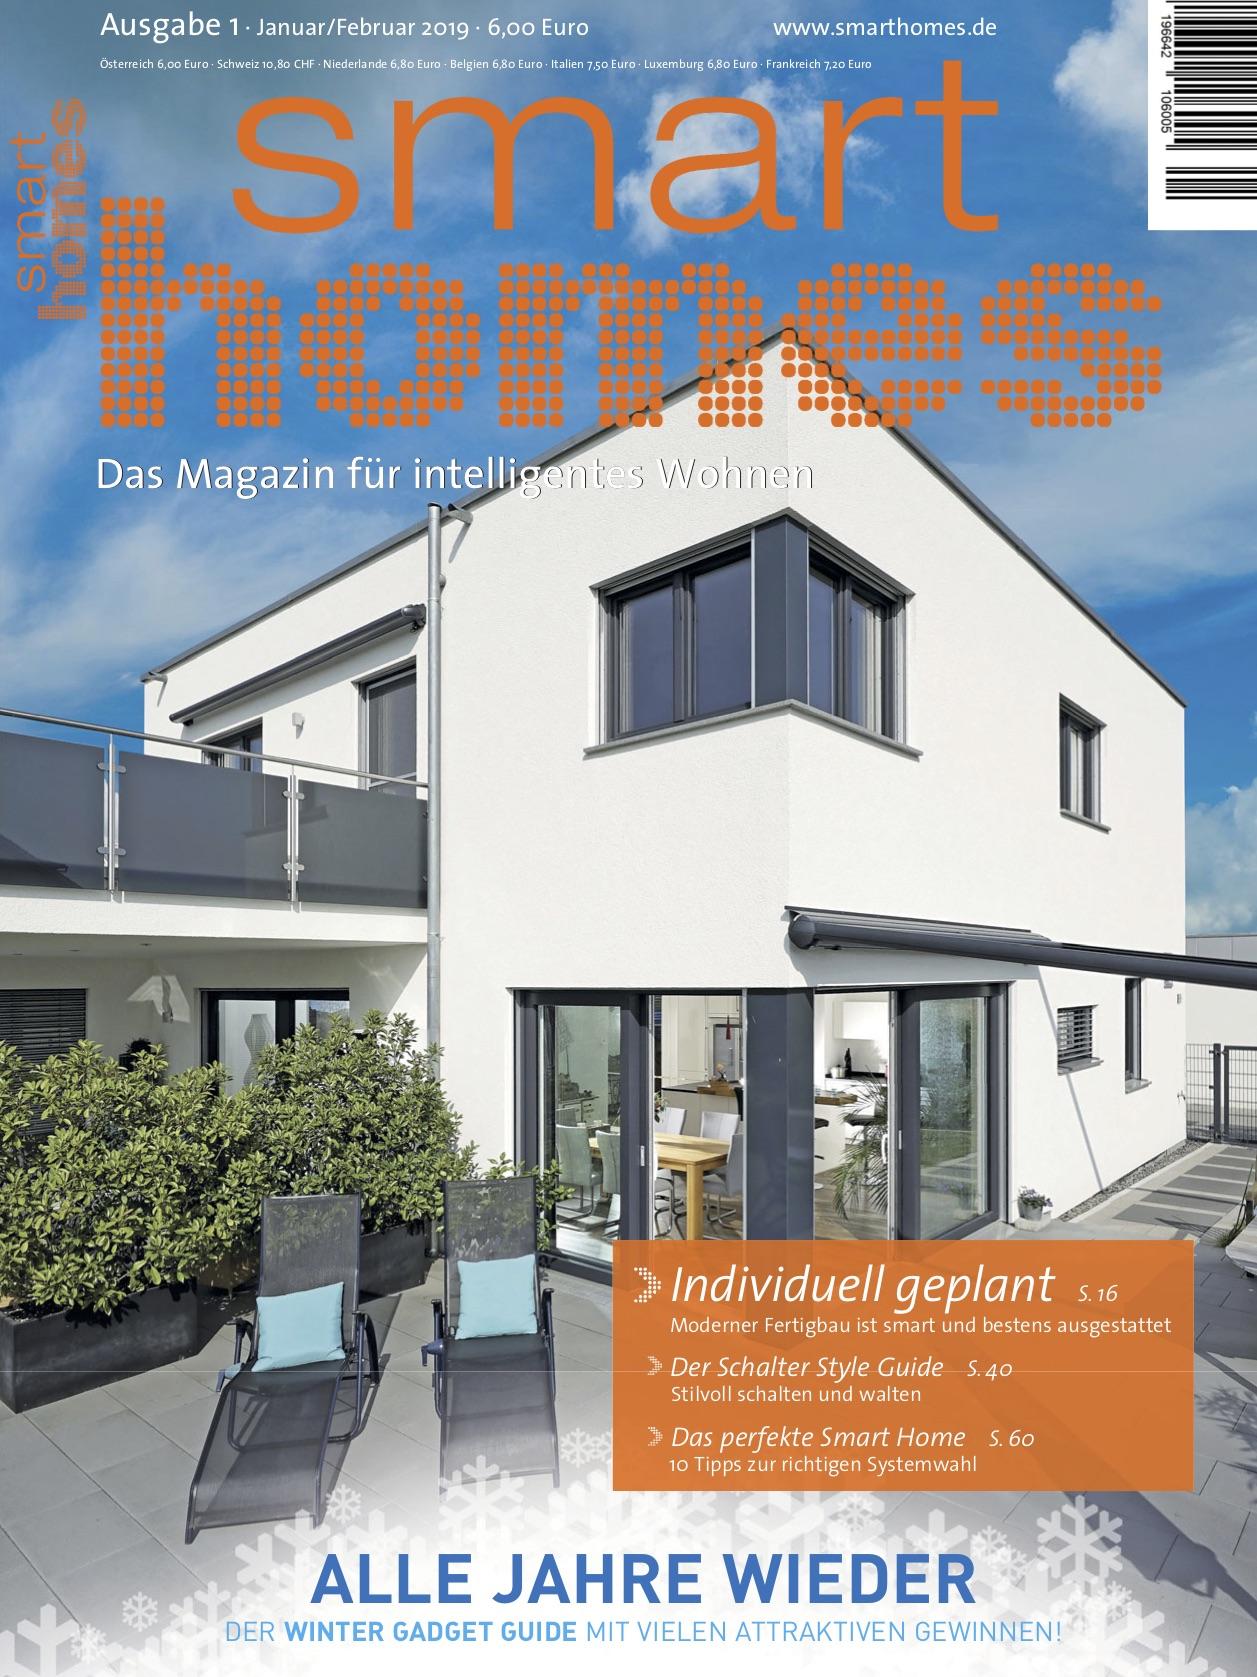 Smart Homes 1.2019